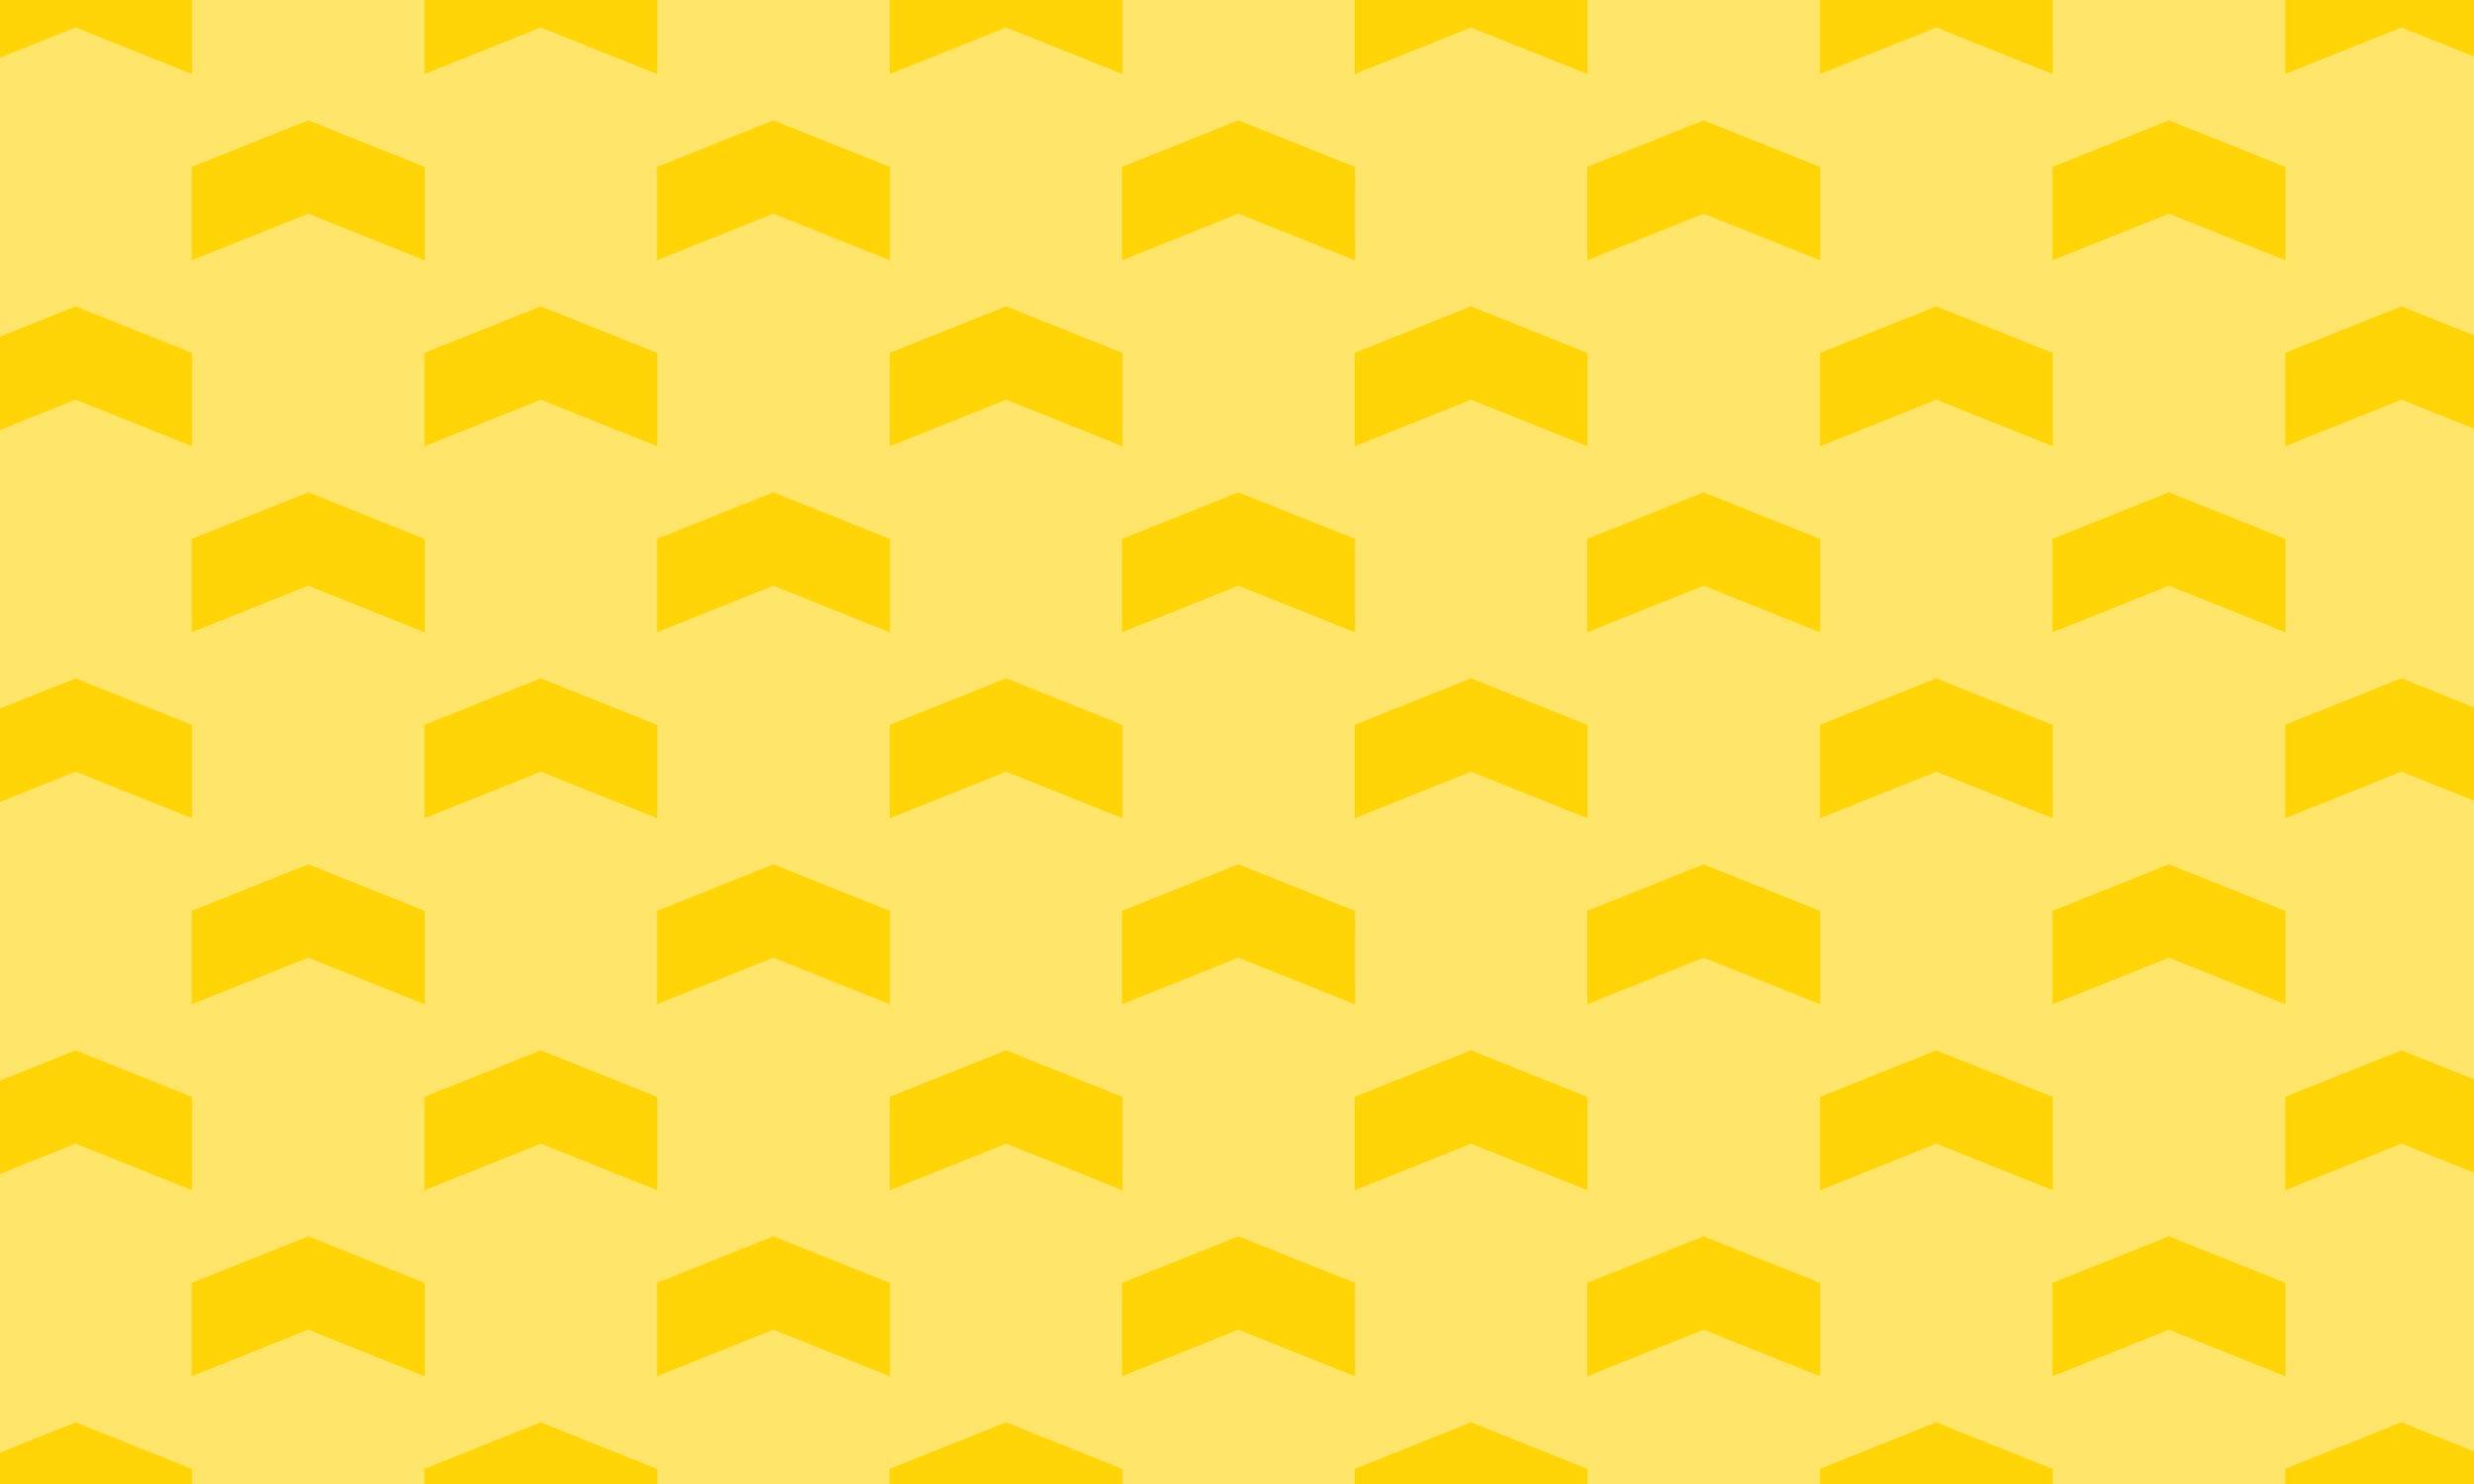 Yellow arrow pattern